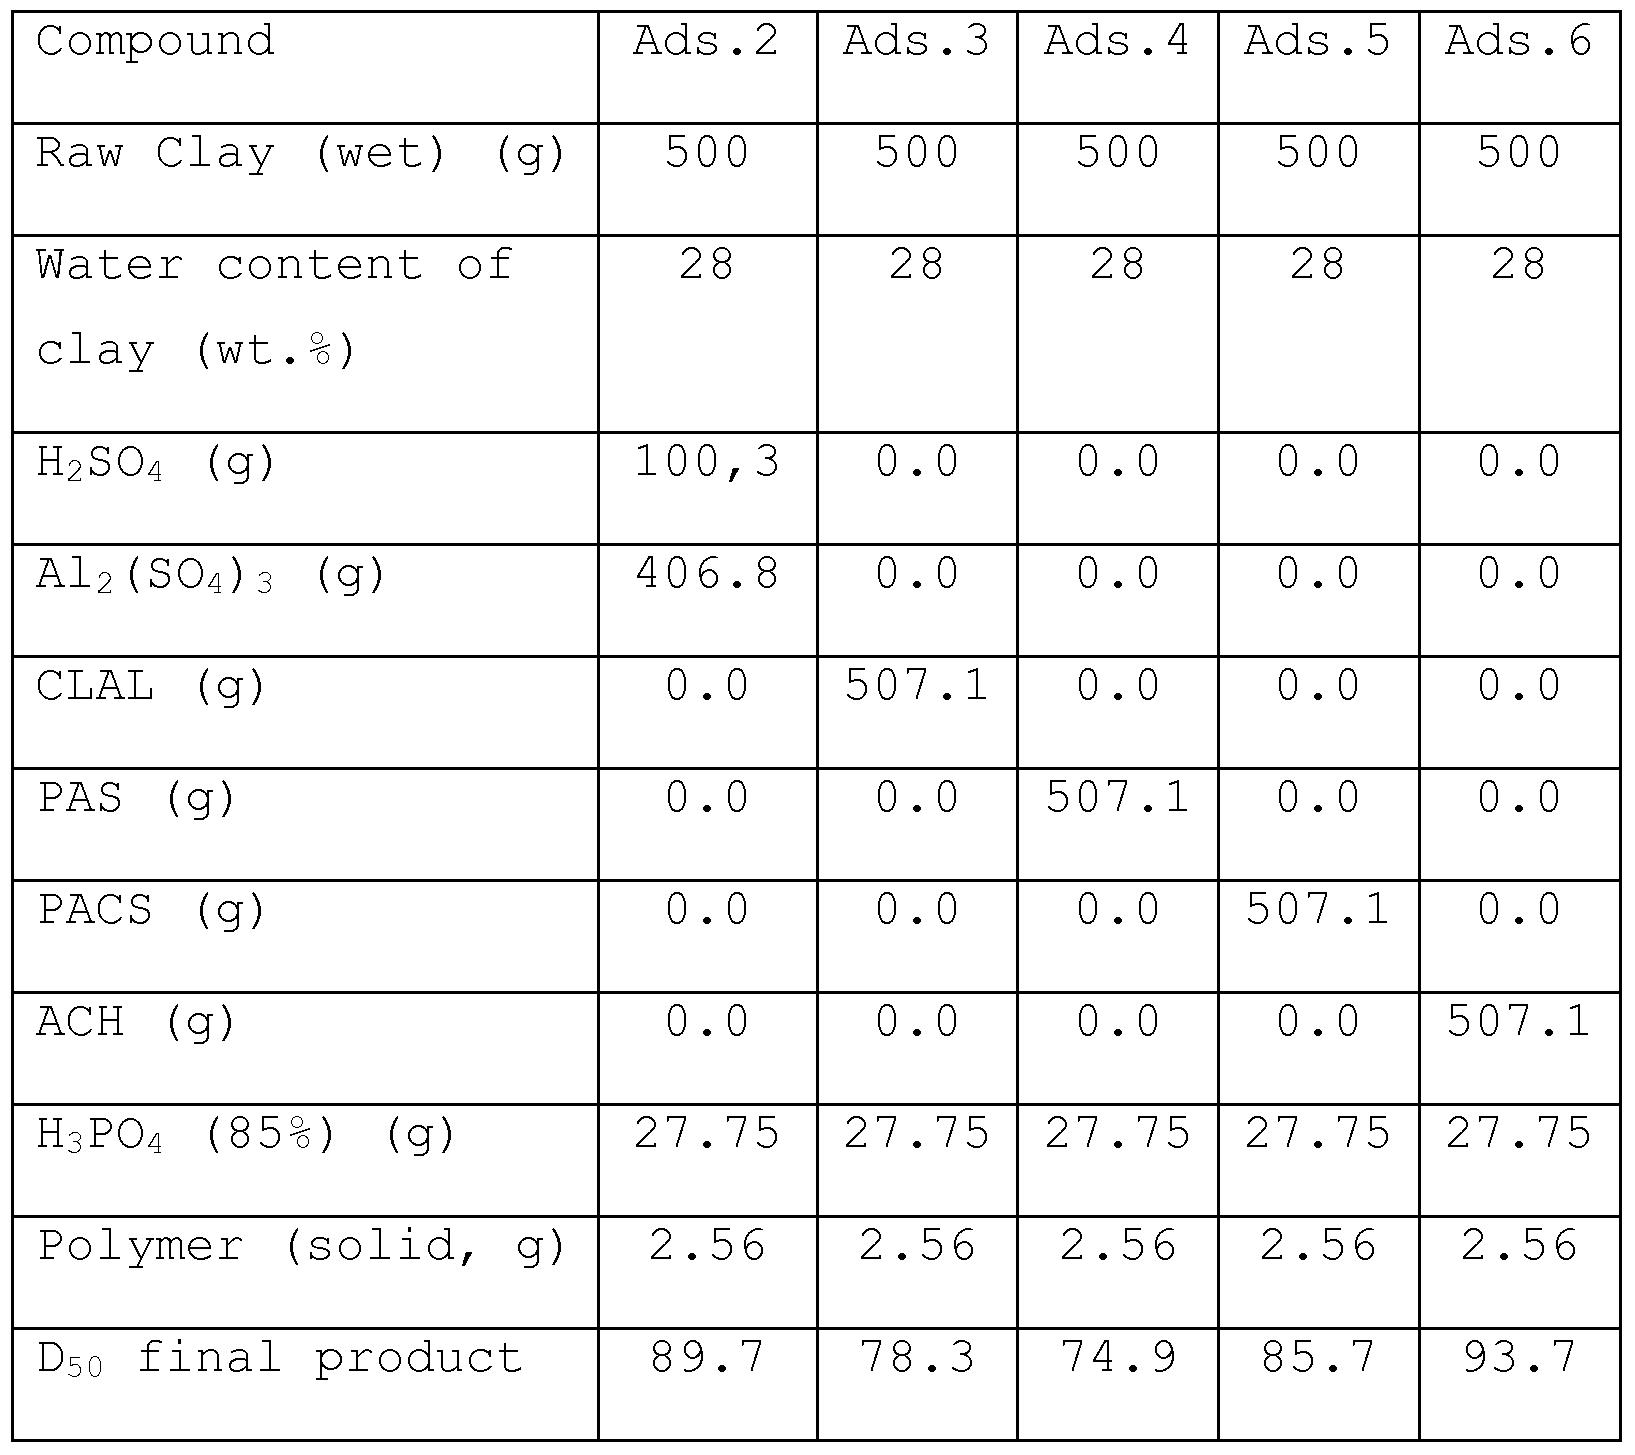 Sud chemie sucks